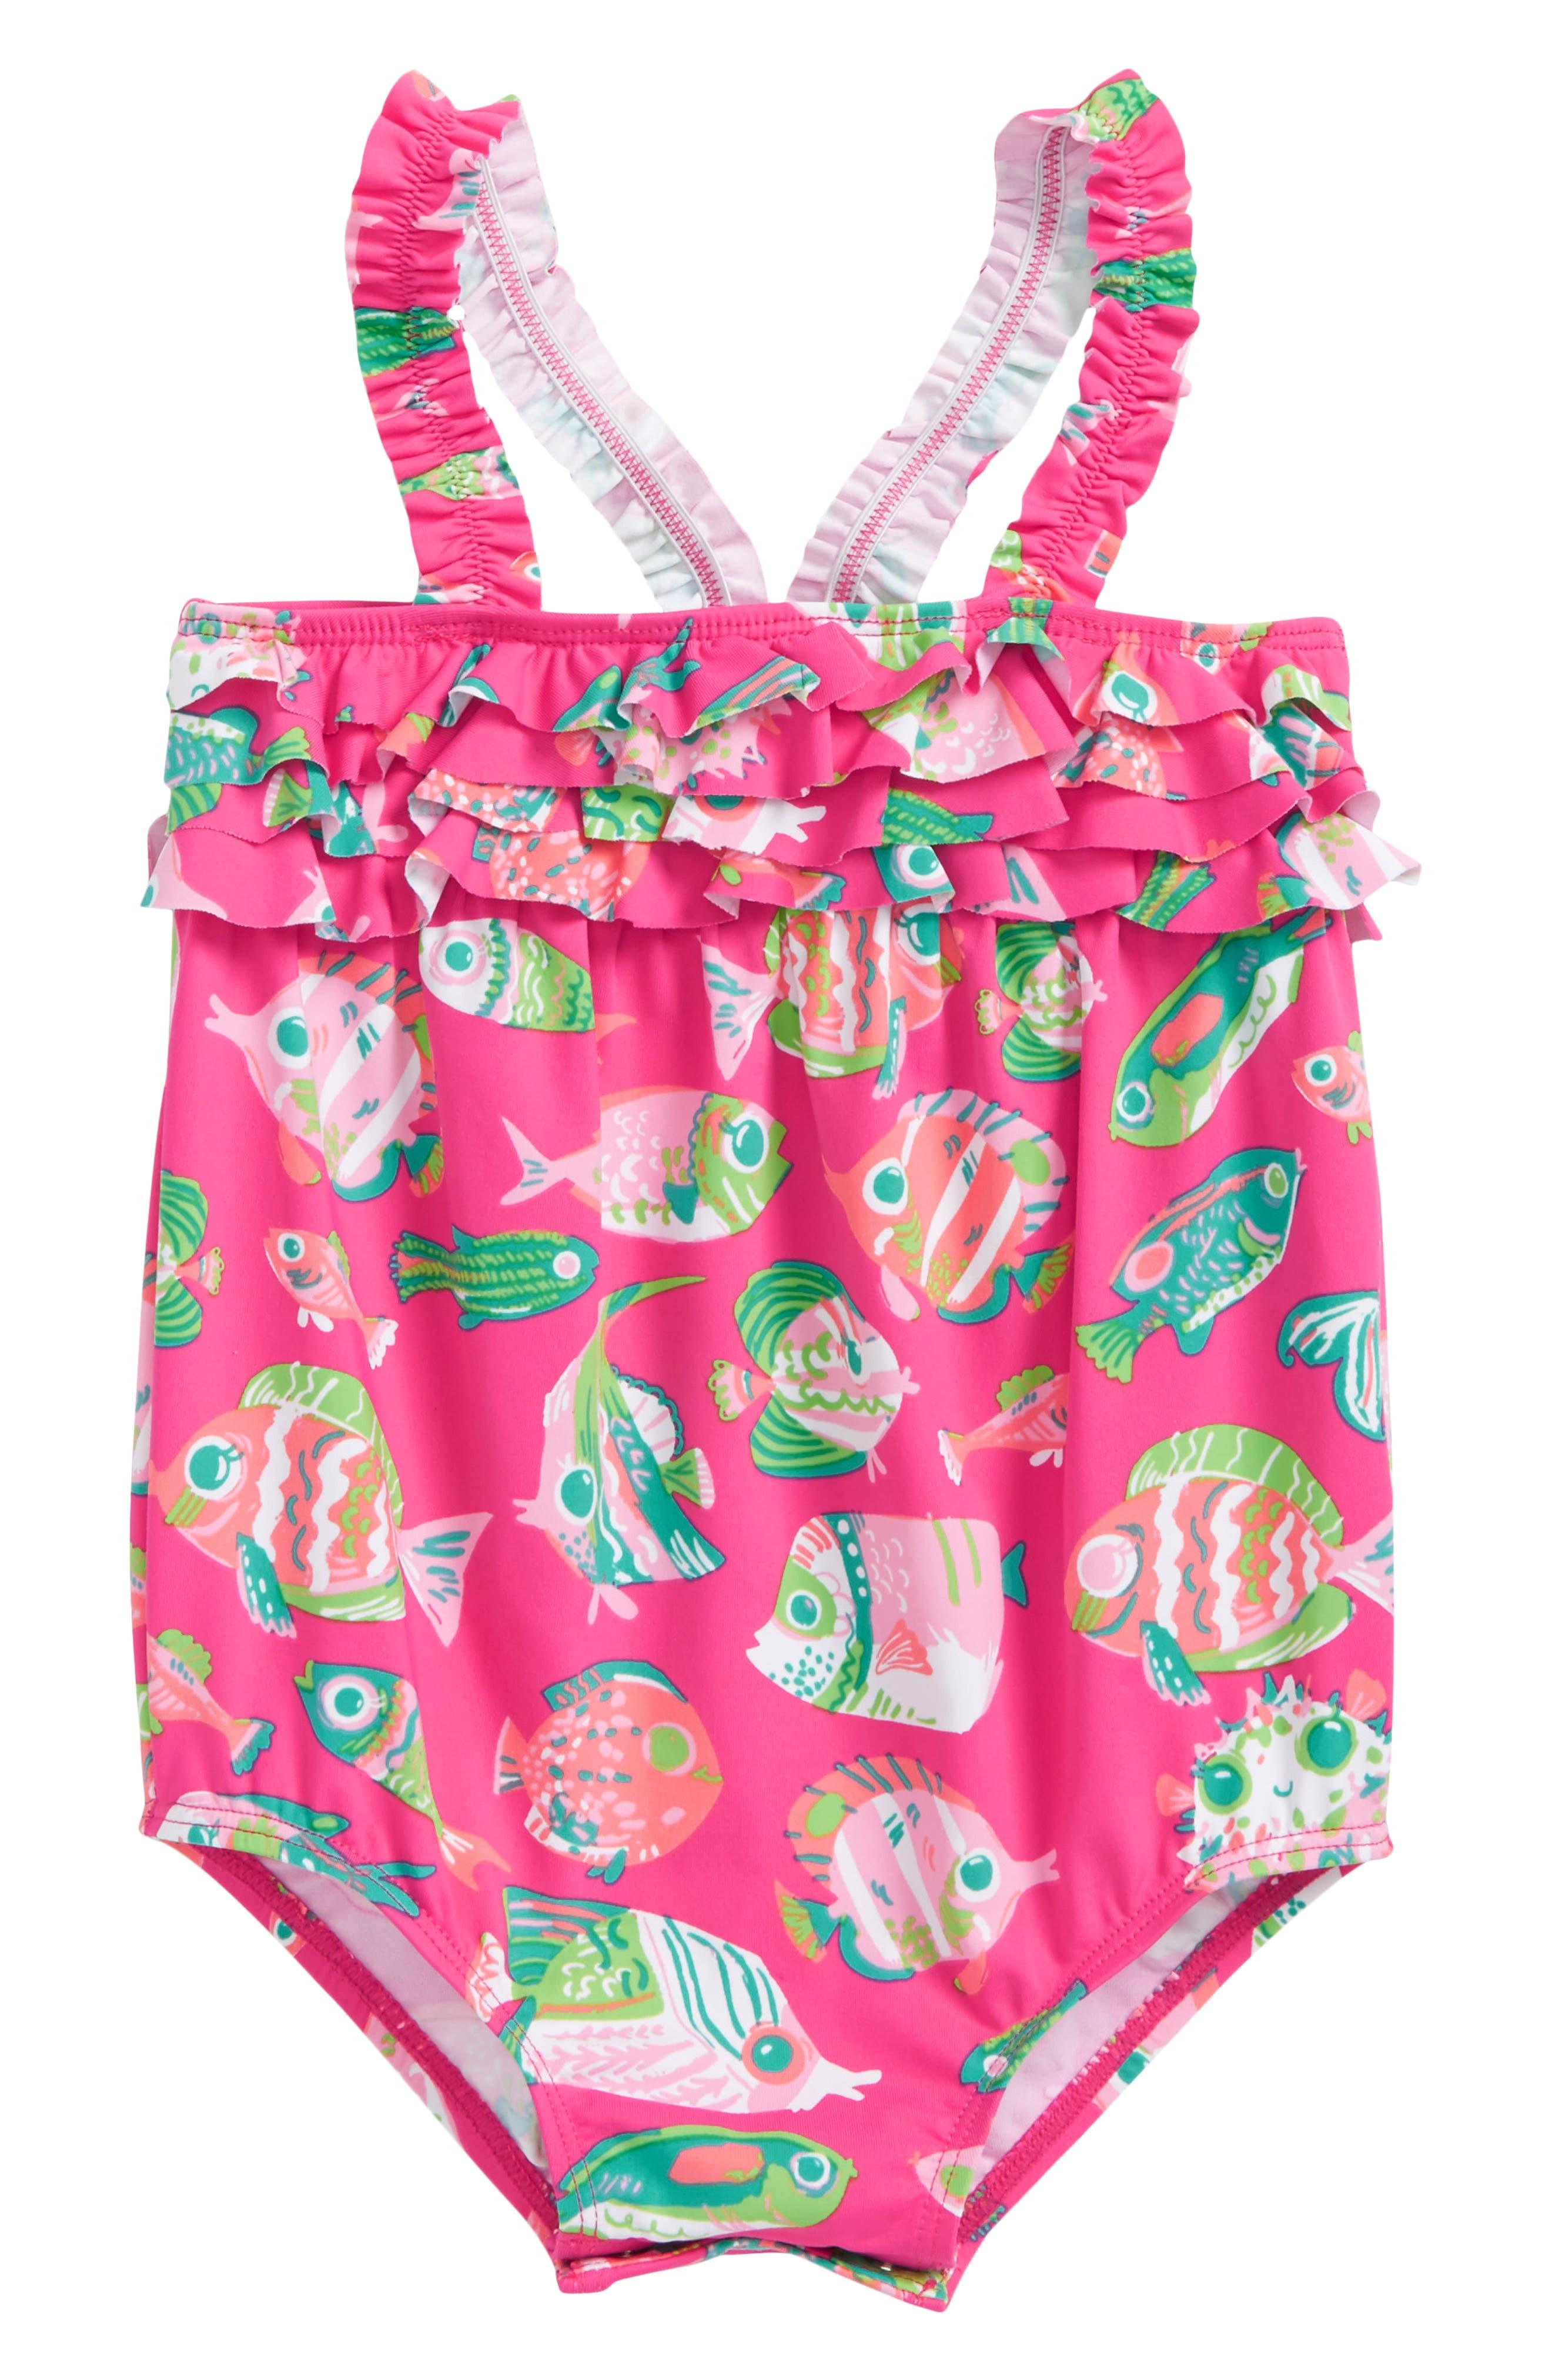 Main Image - Hatley Fish One-Piece Swimsuit (Baby Girls)